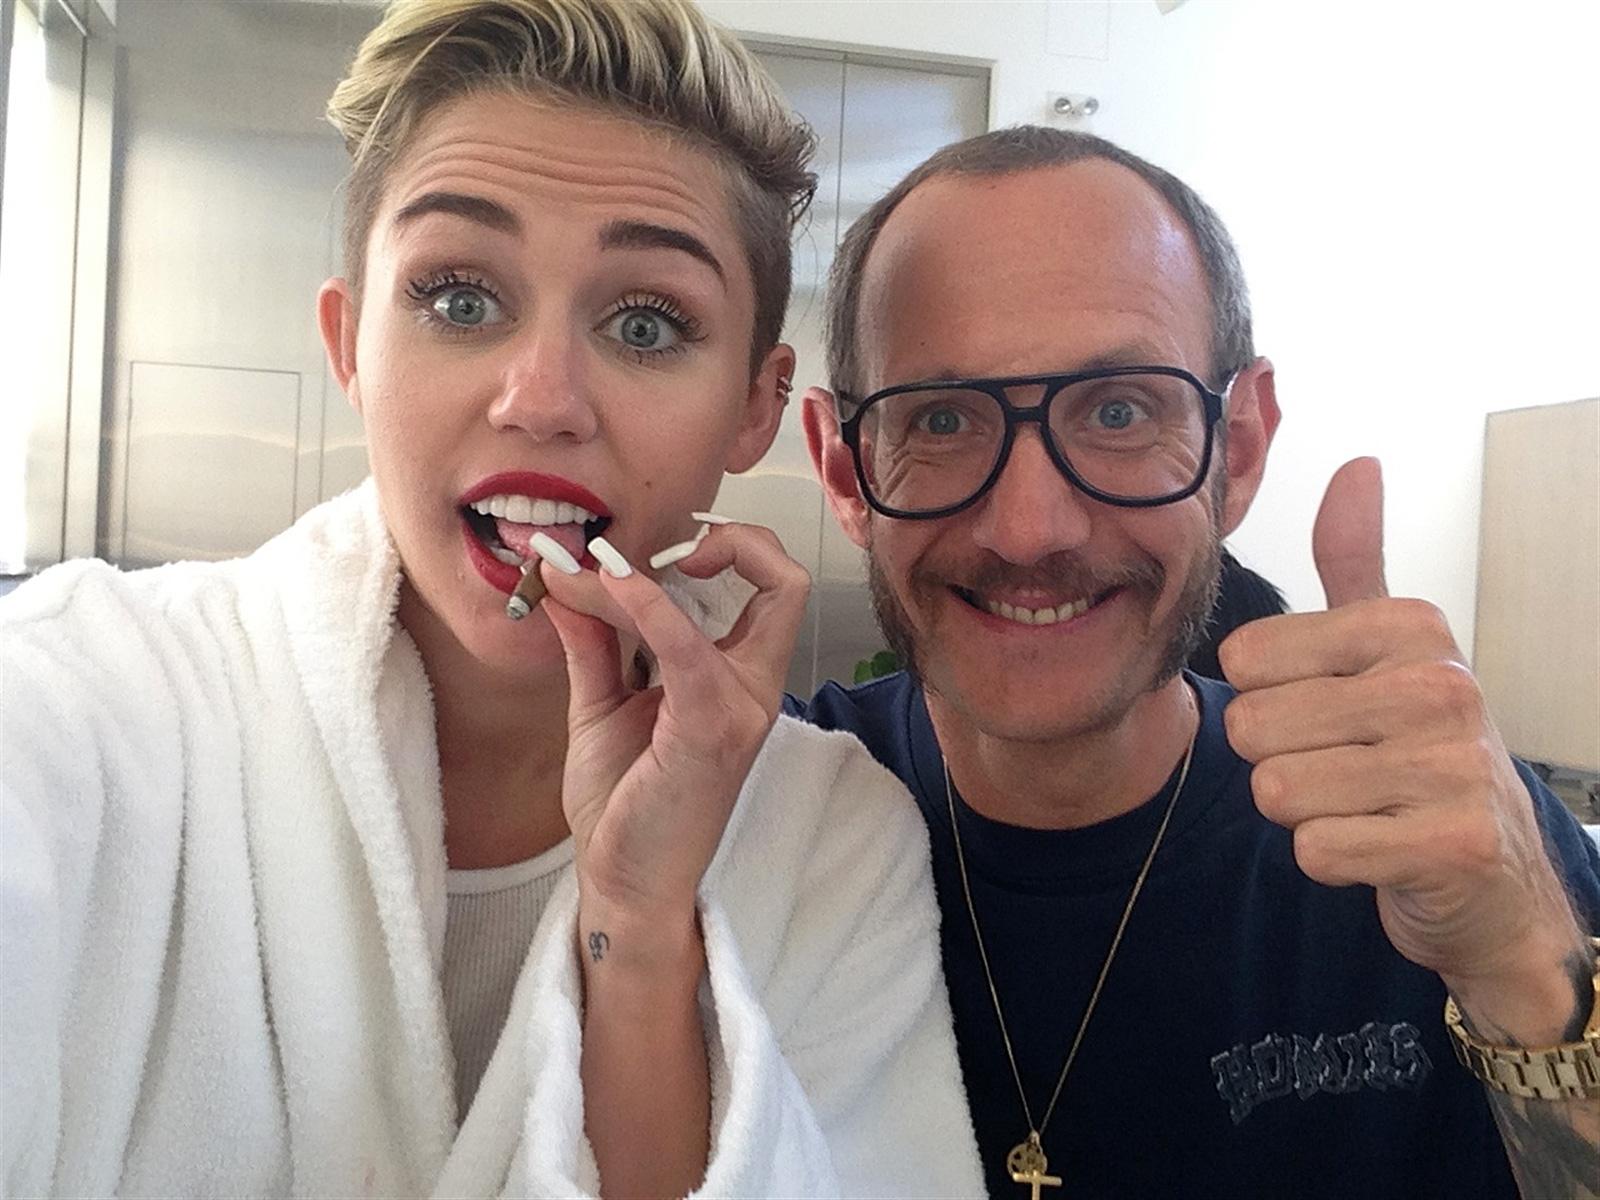 Miley cirus nude scandal frank